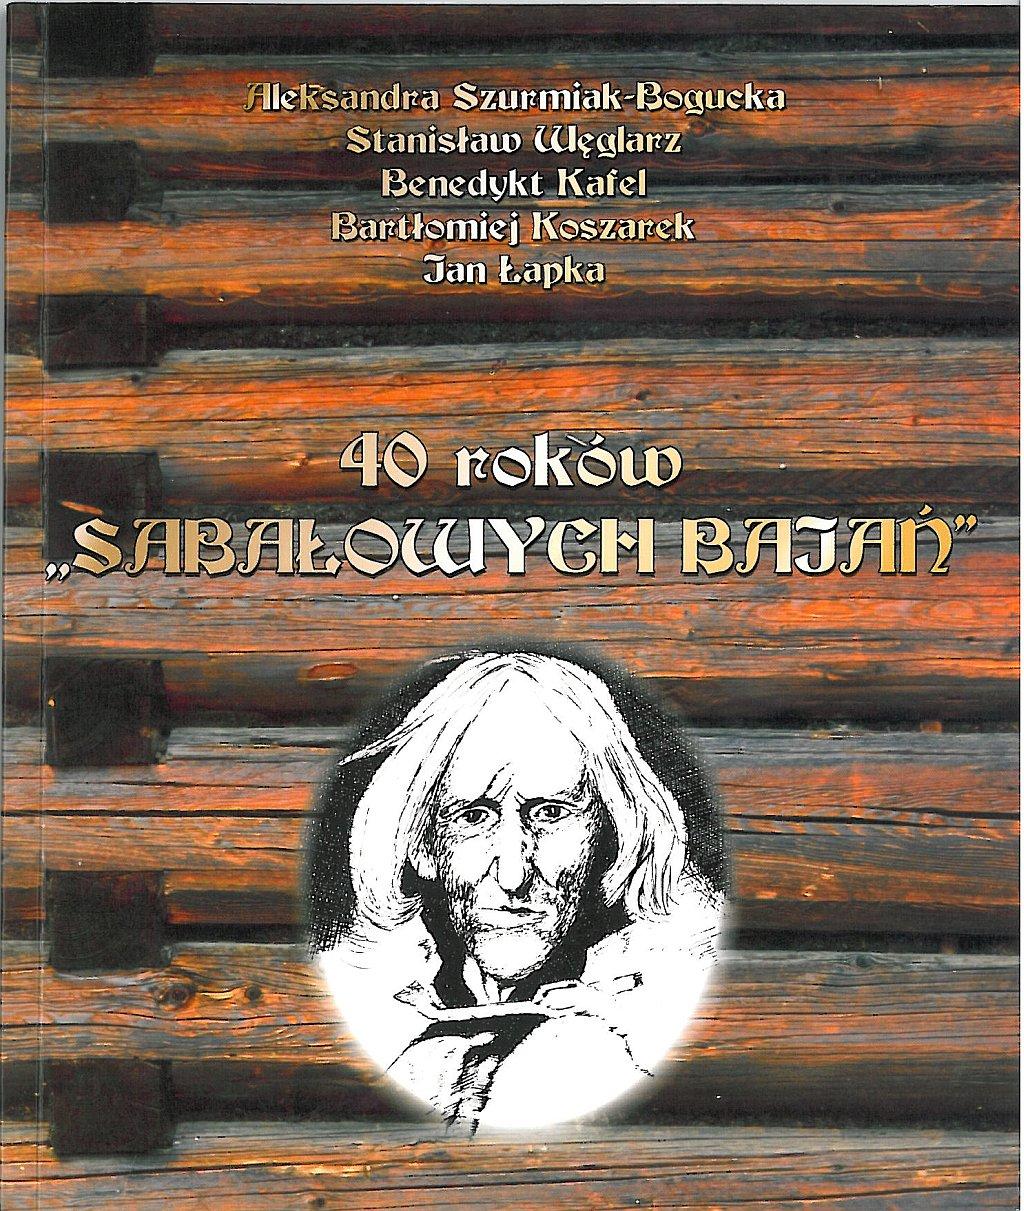 40rokowsabalowychbajan2006